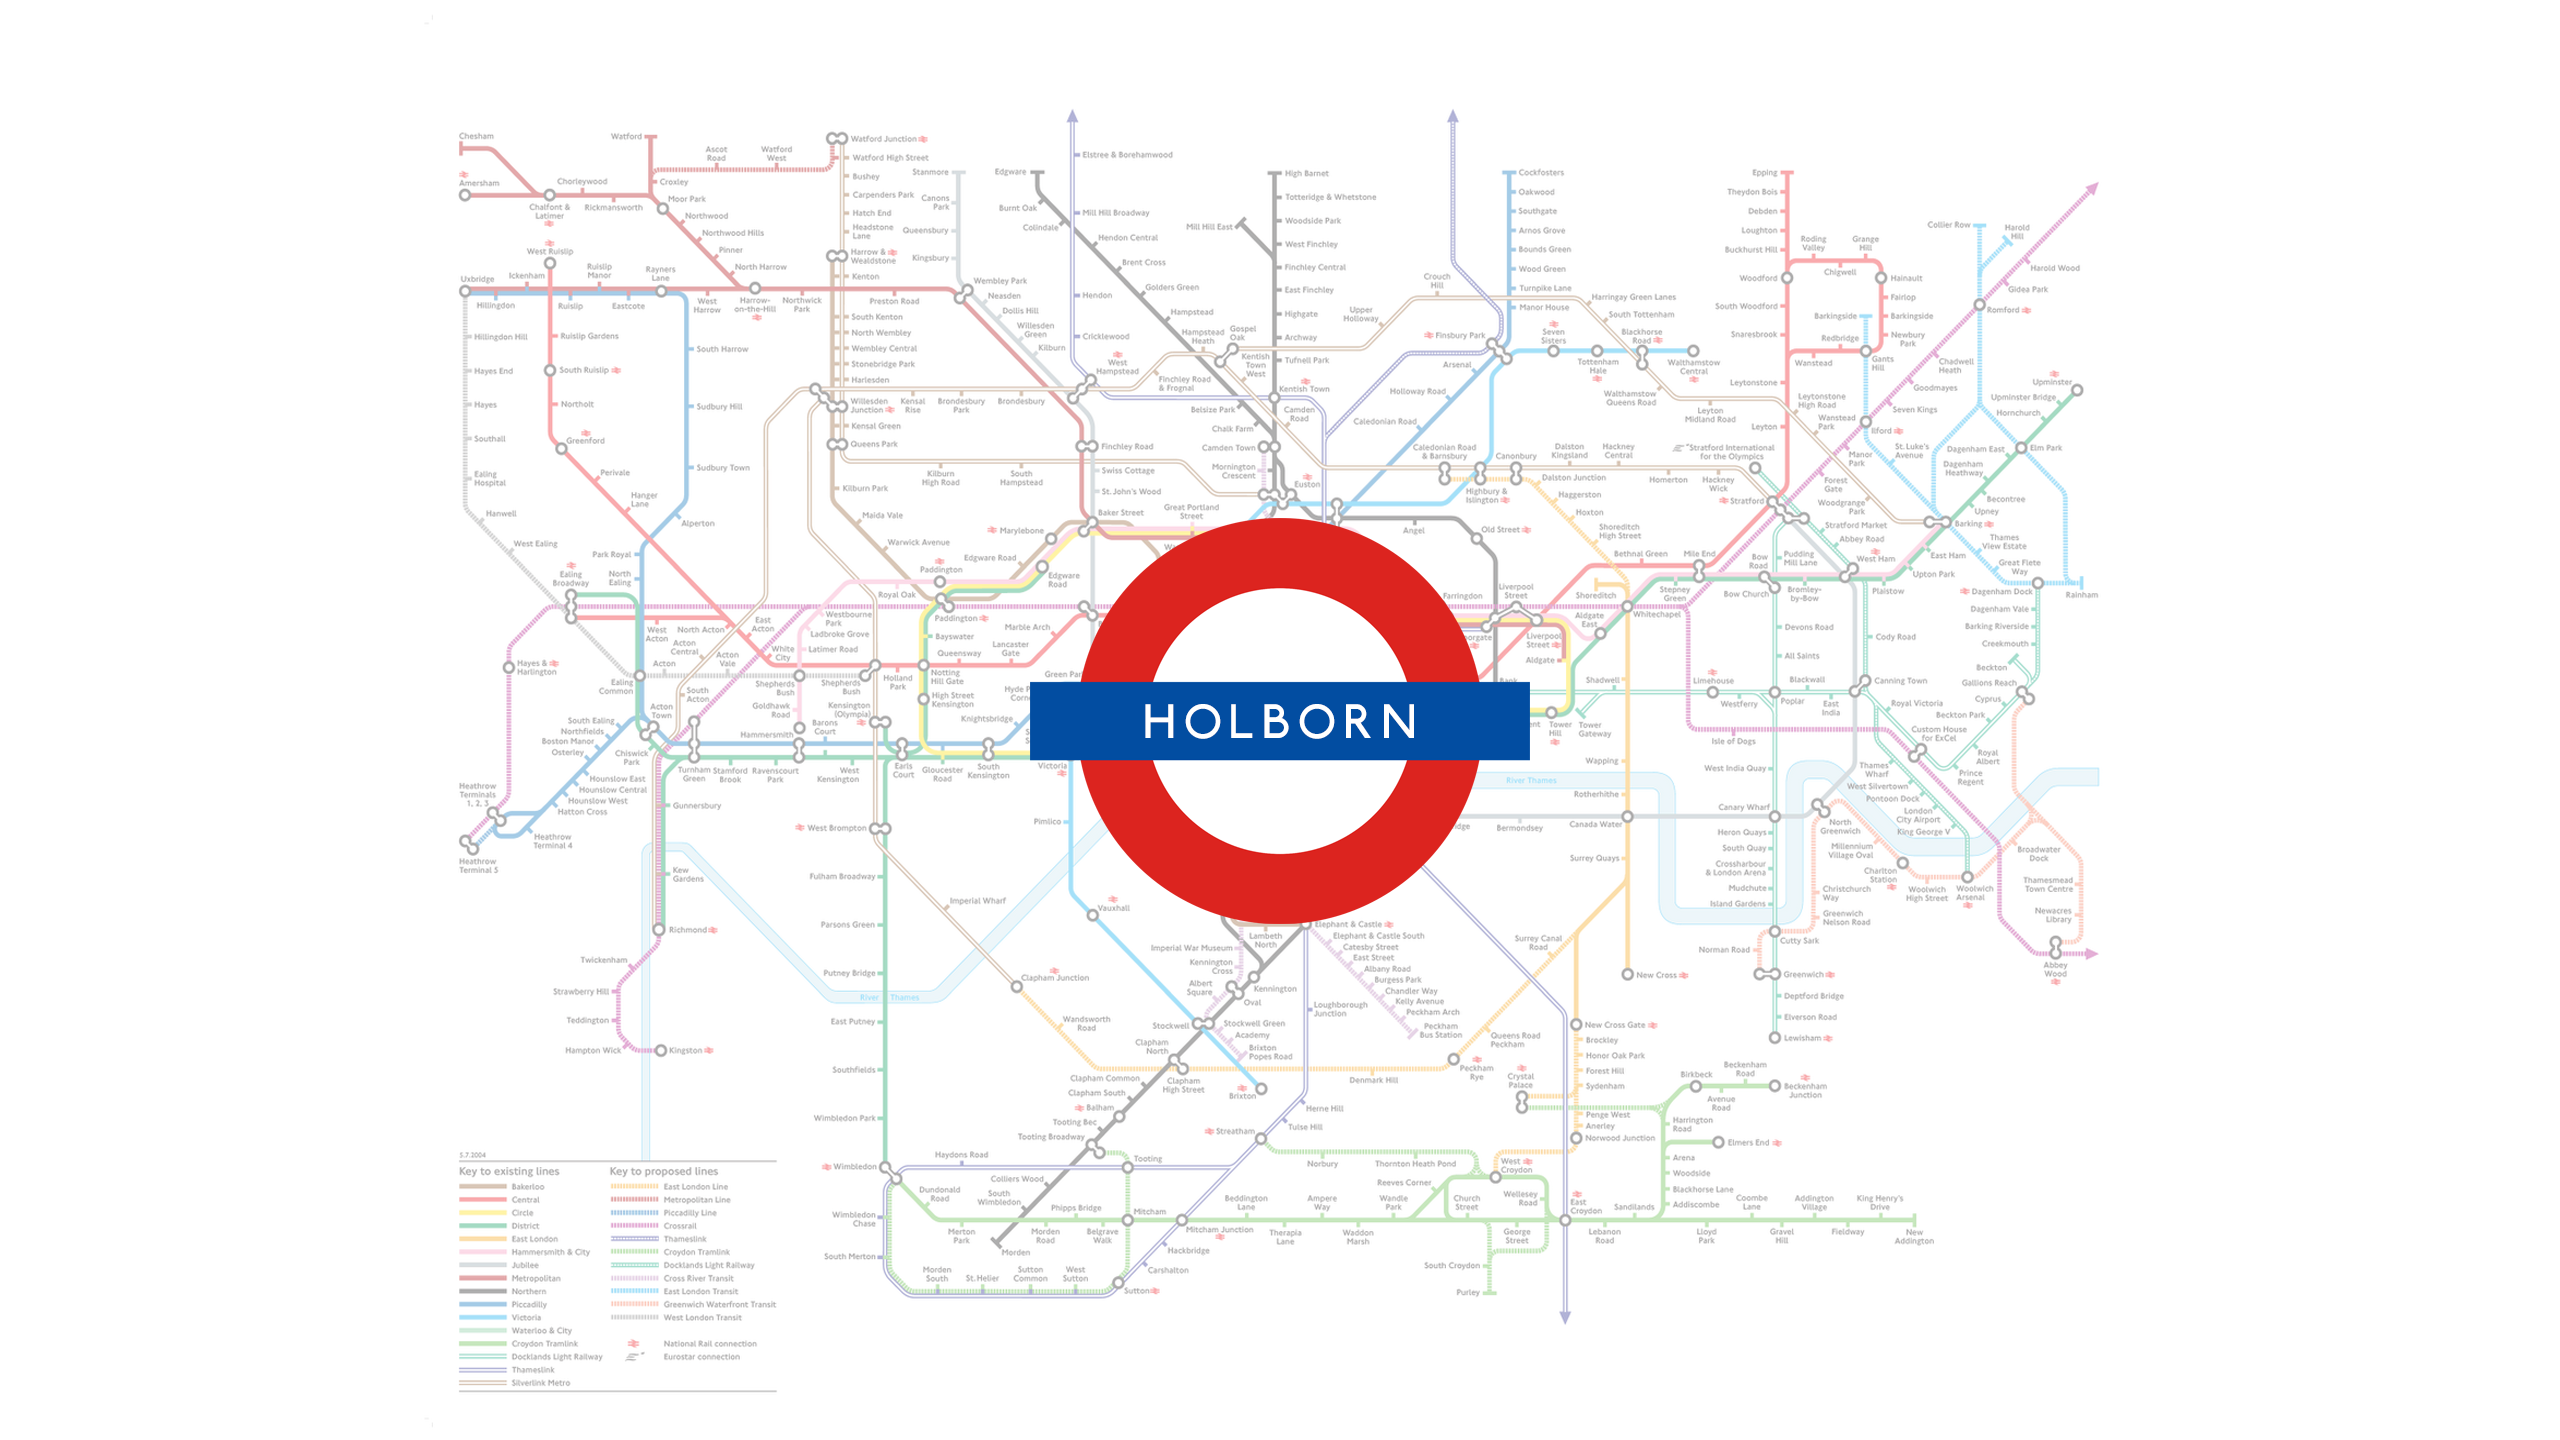 Holborn (Map)